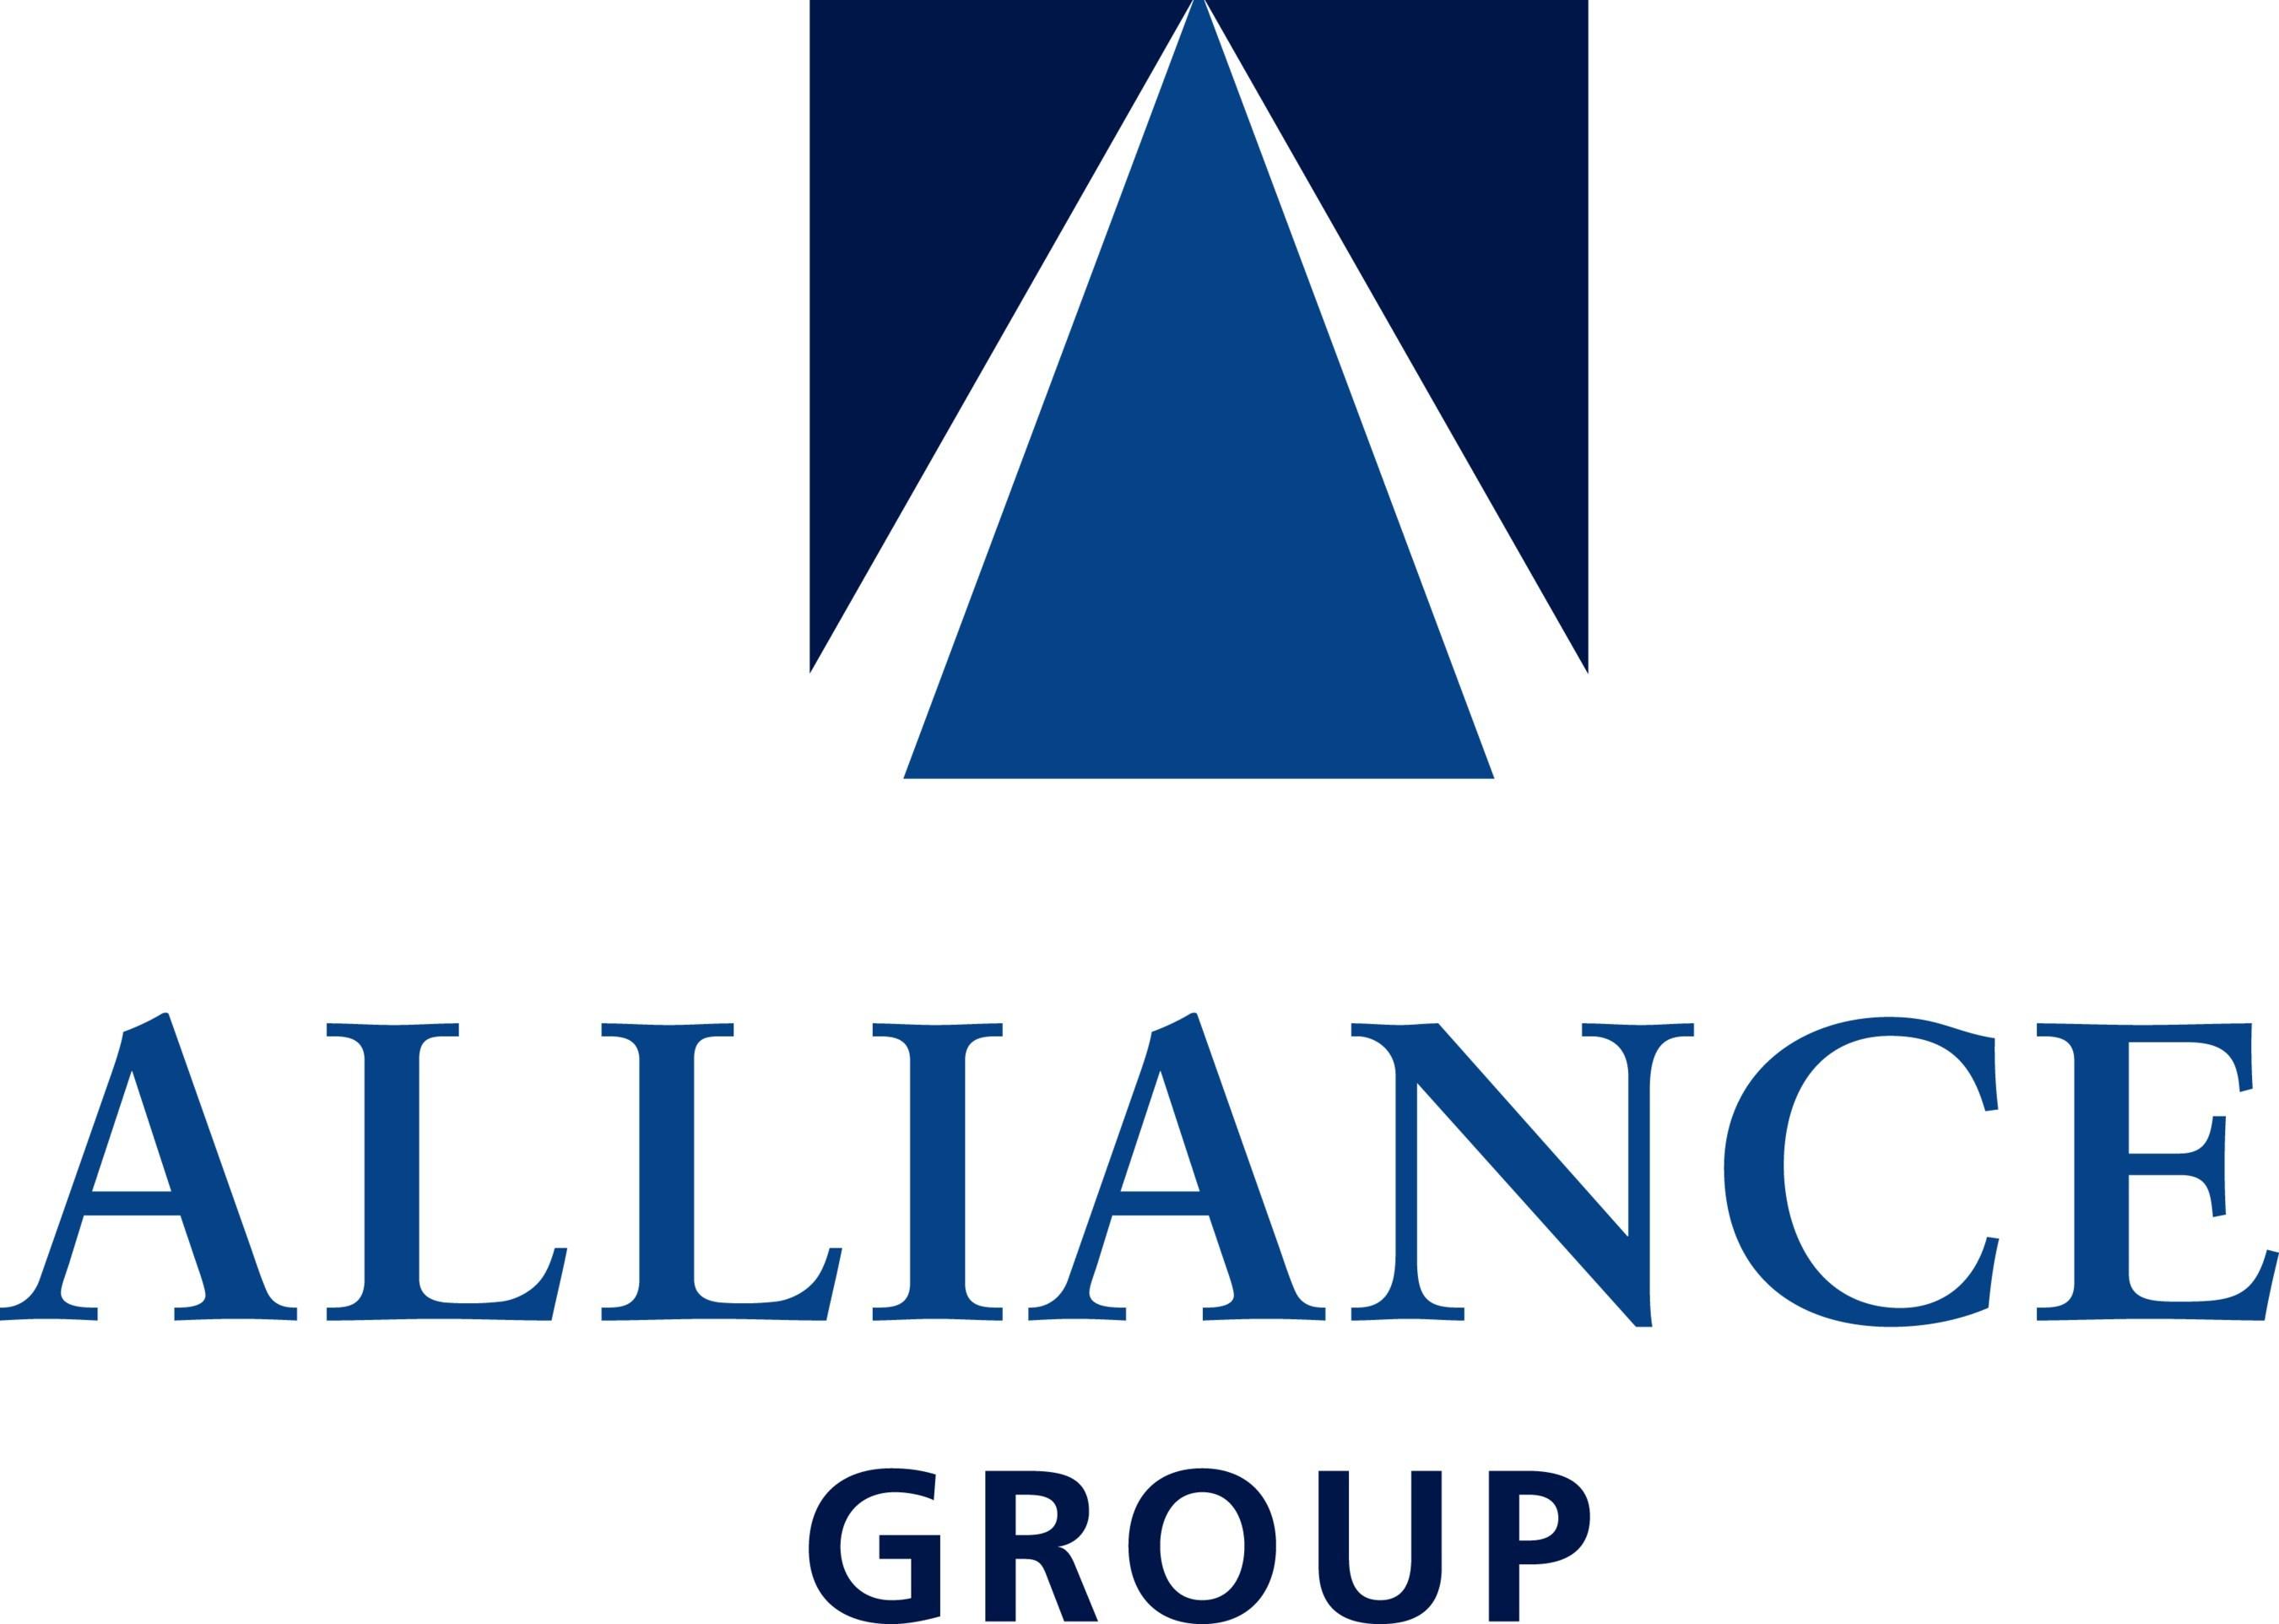 ALLIANCE GROUP logo